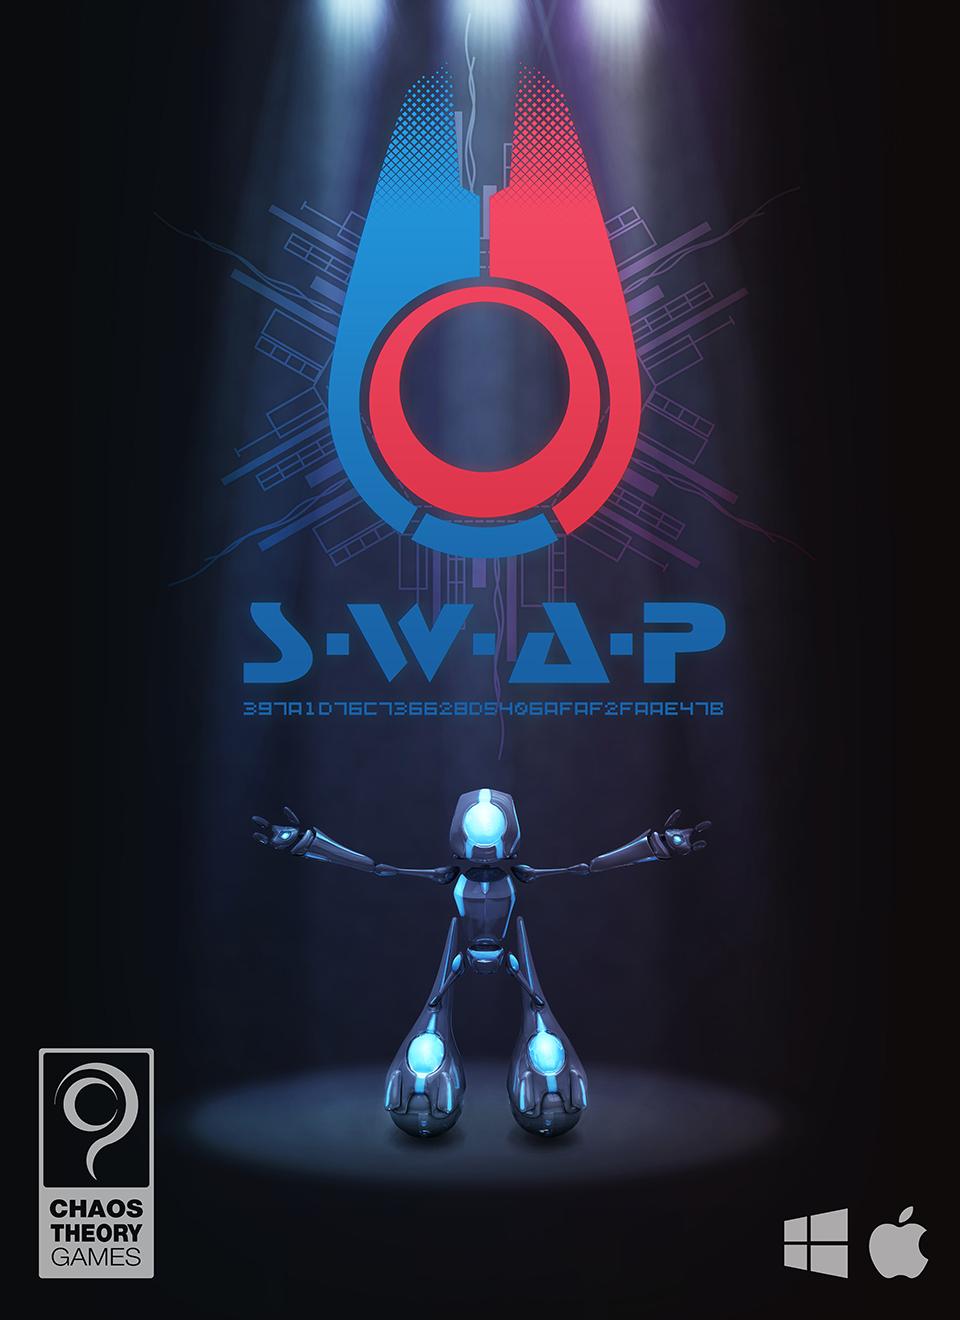 S.W.A.P